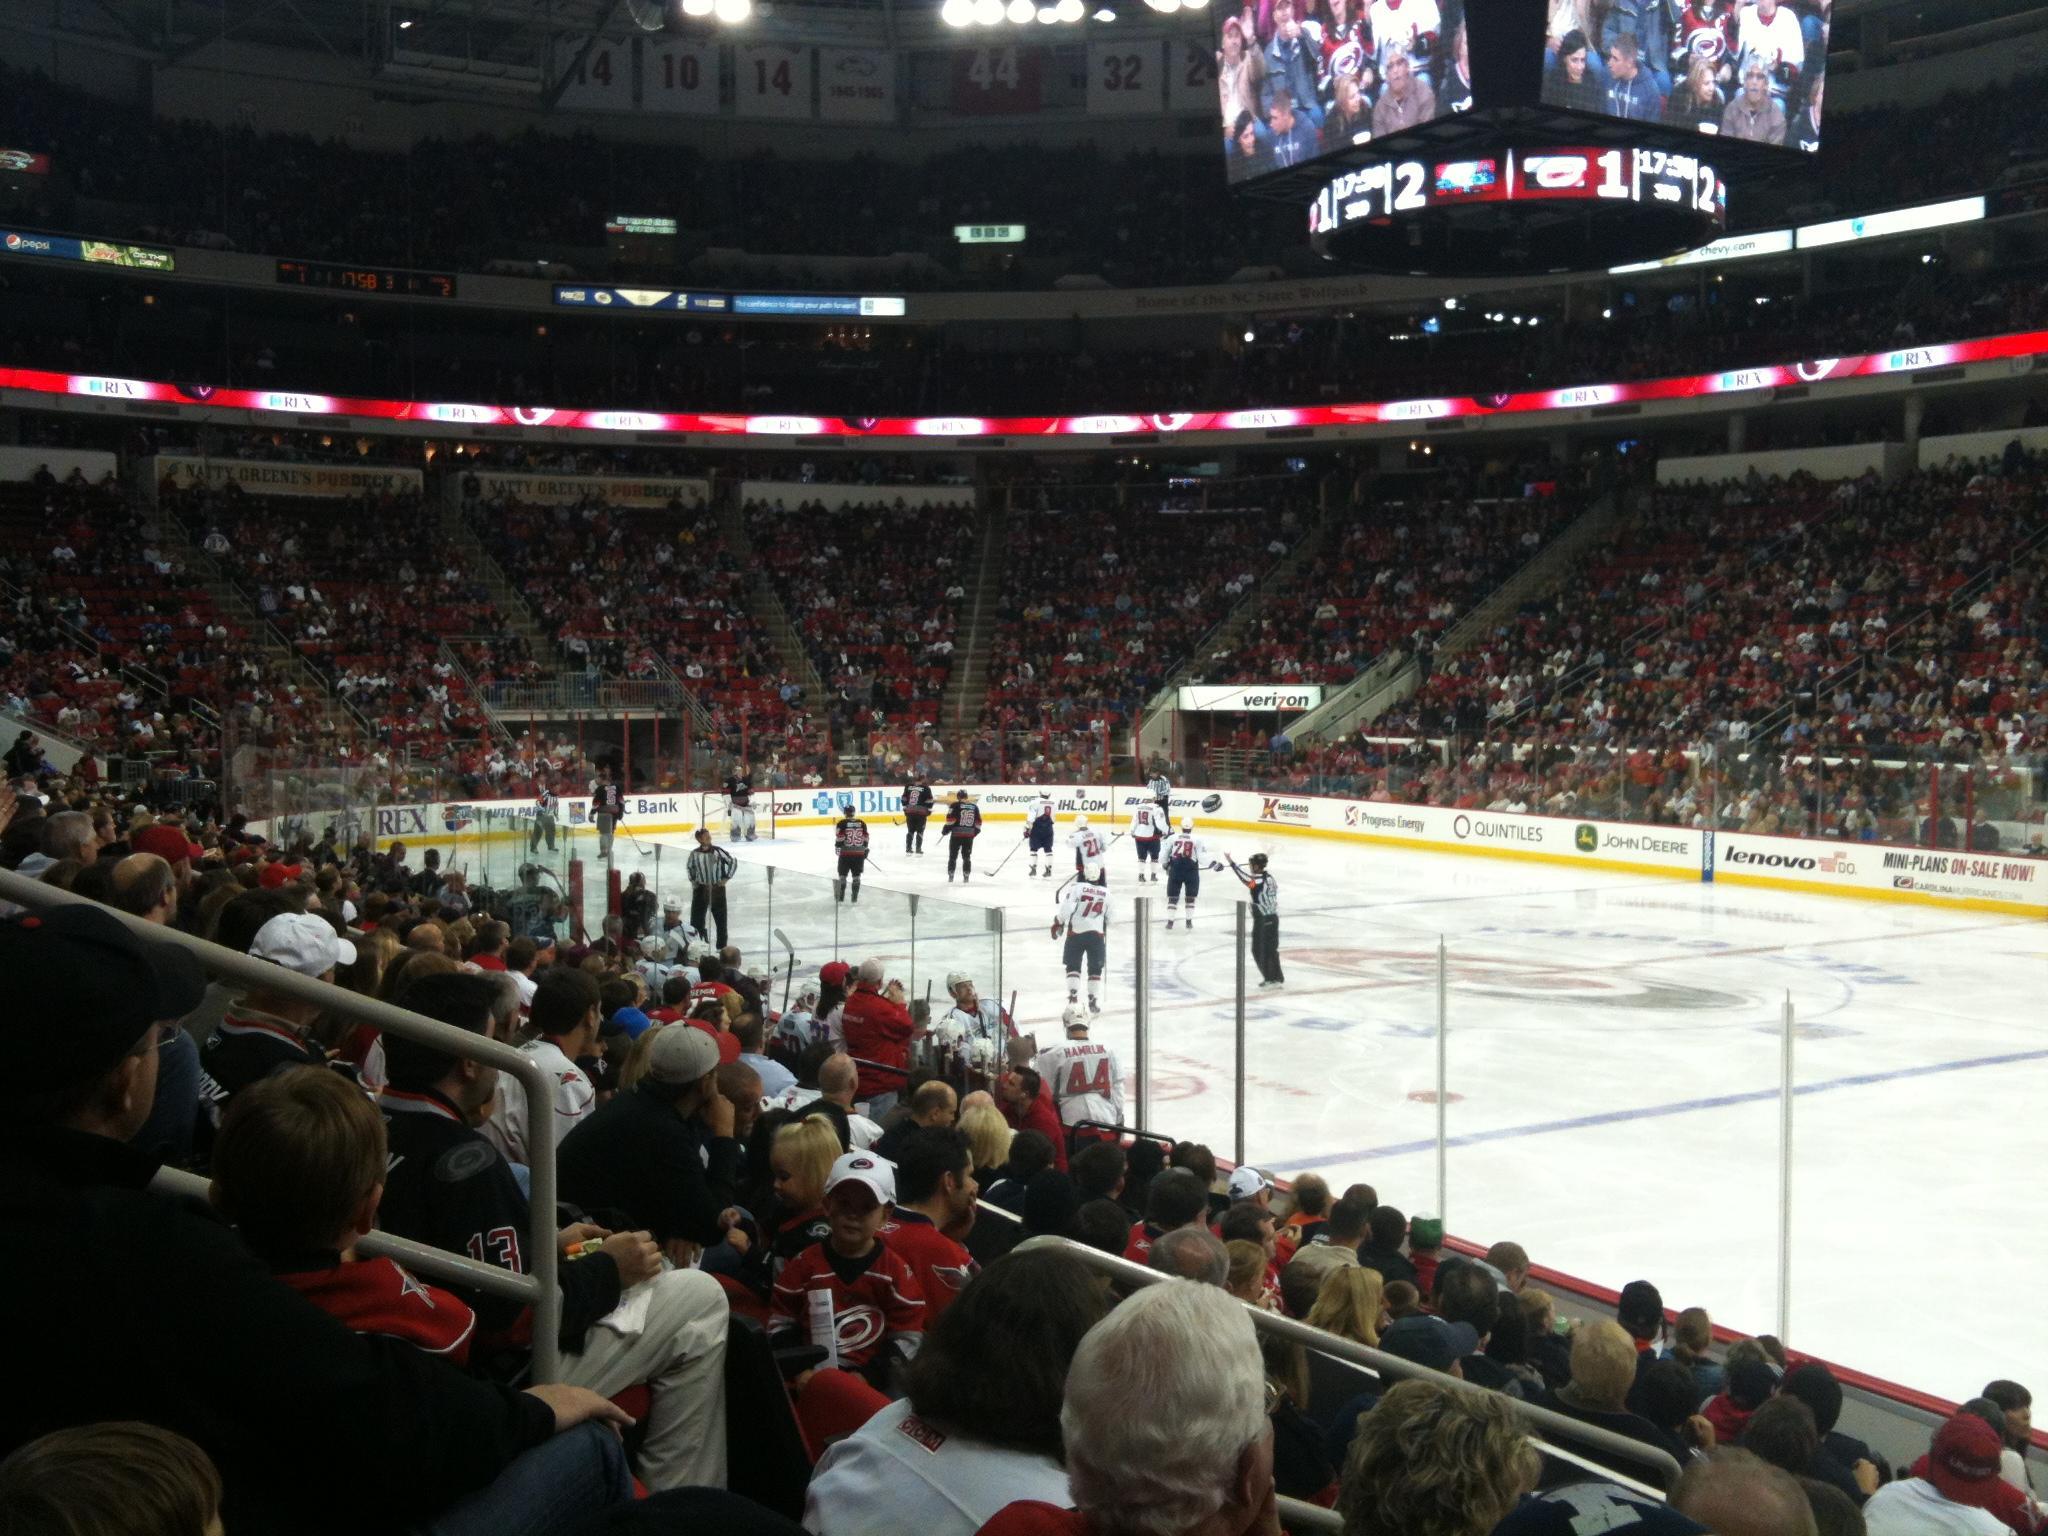 PNC Arena section 101 row L seat 3 - Carolina Hurricanes vs Washington Capitals